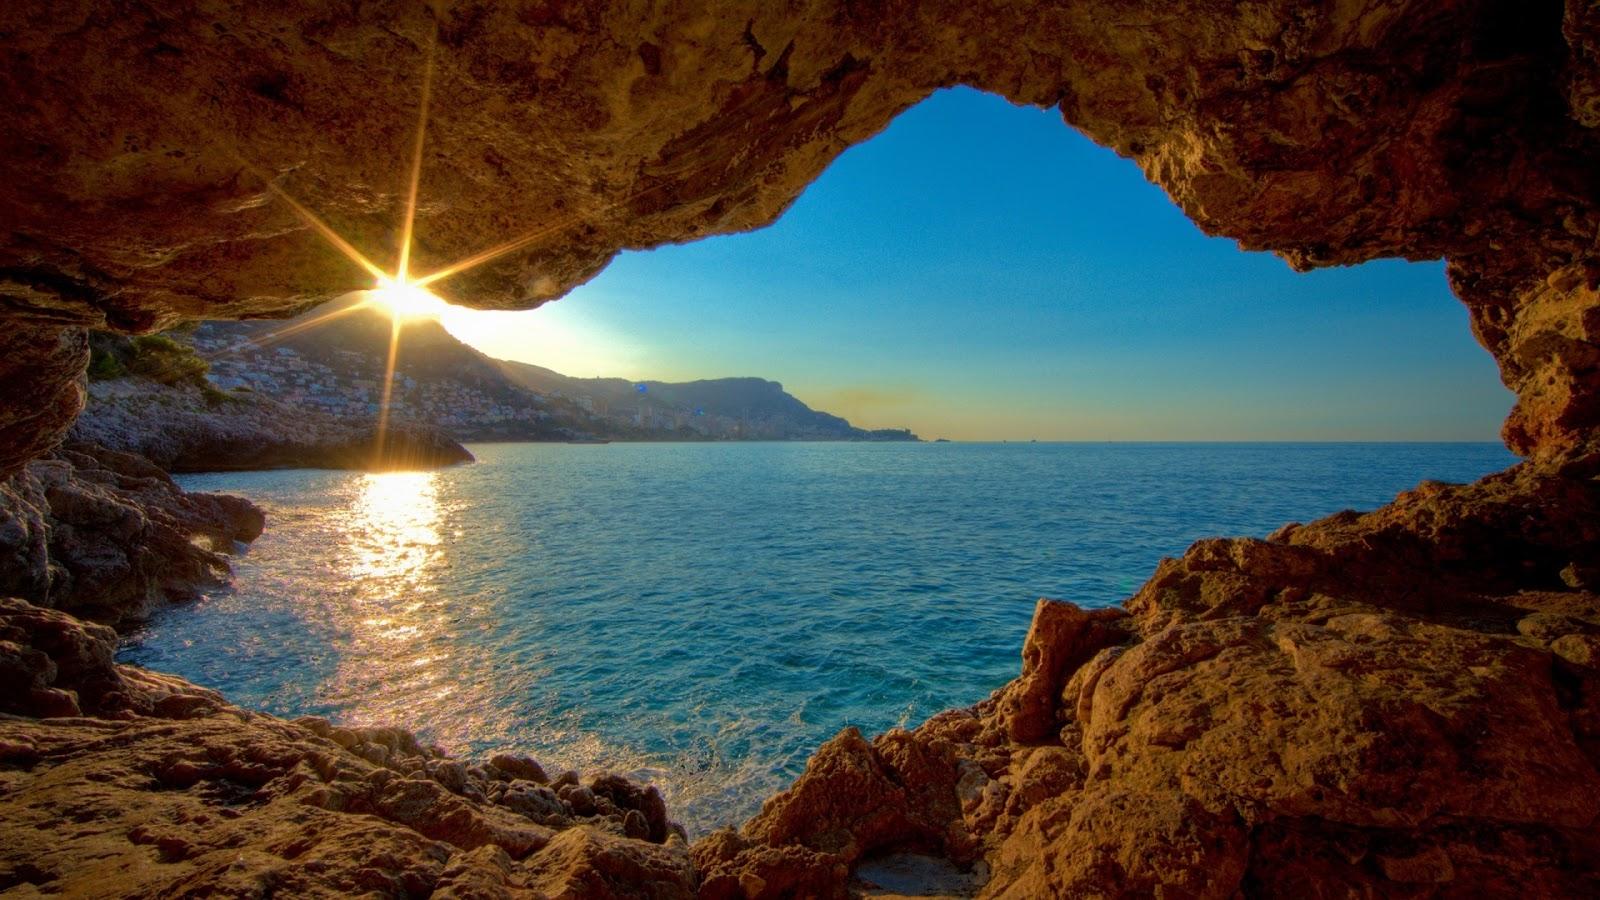 scenery wallpaper hd 1080p,nature,sea,formation,sky,coastal and oceanic landforms